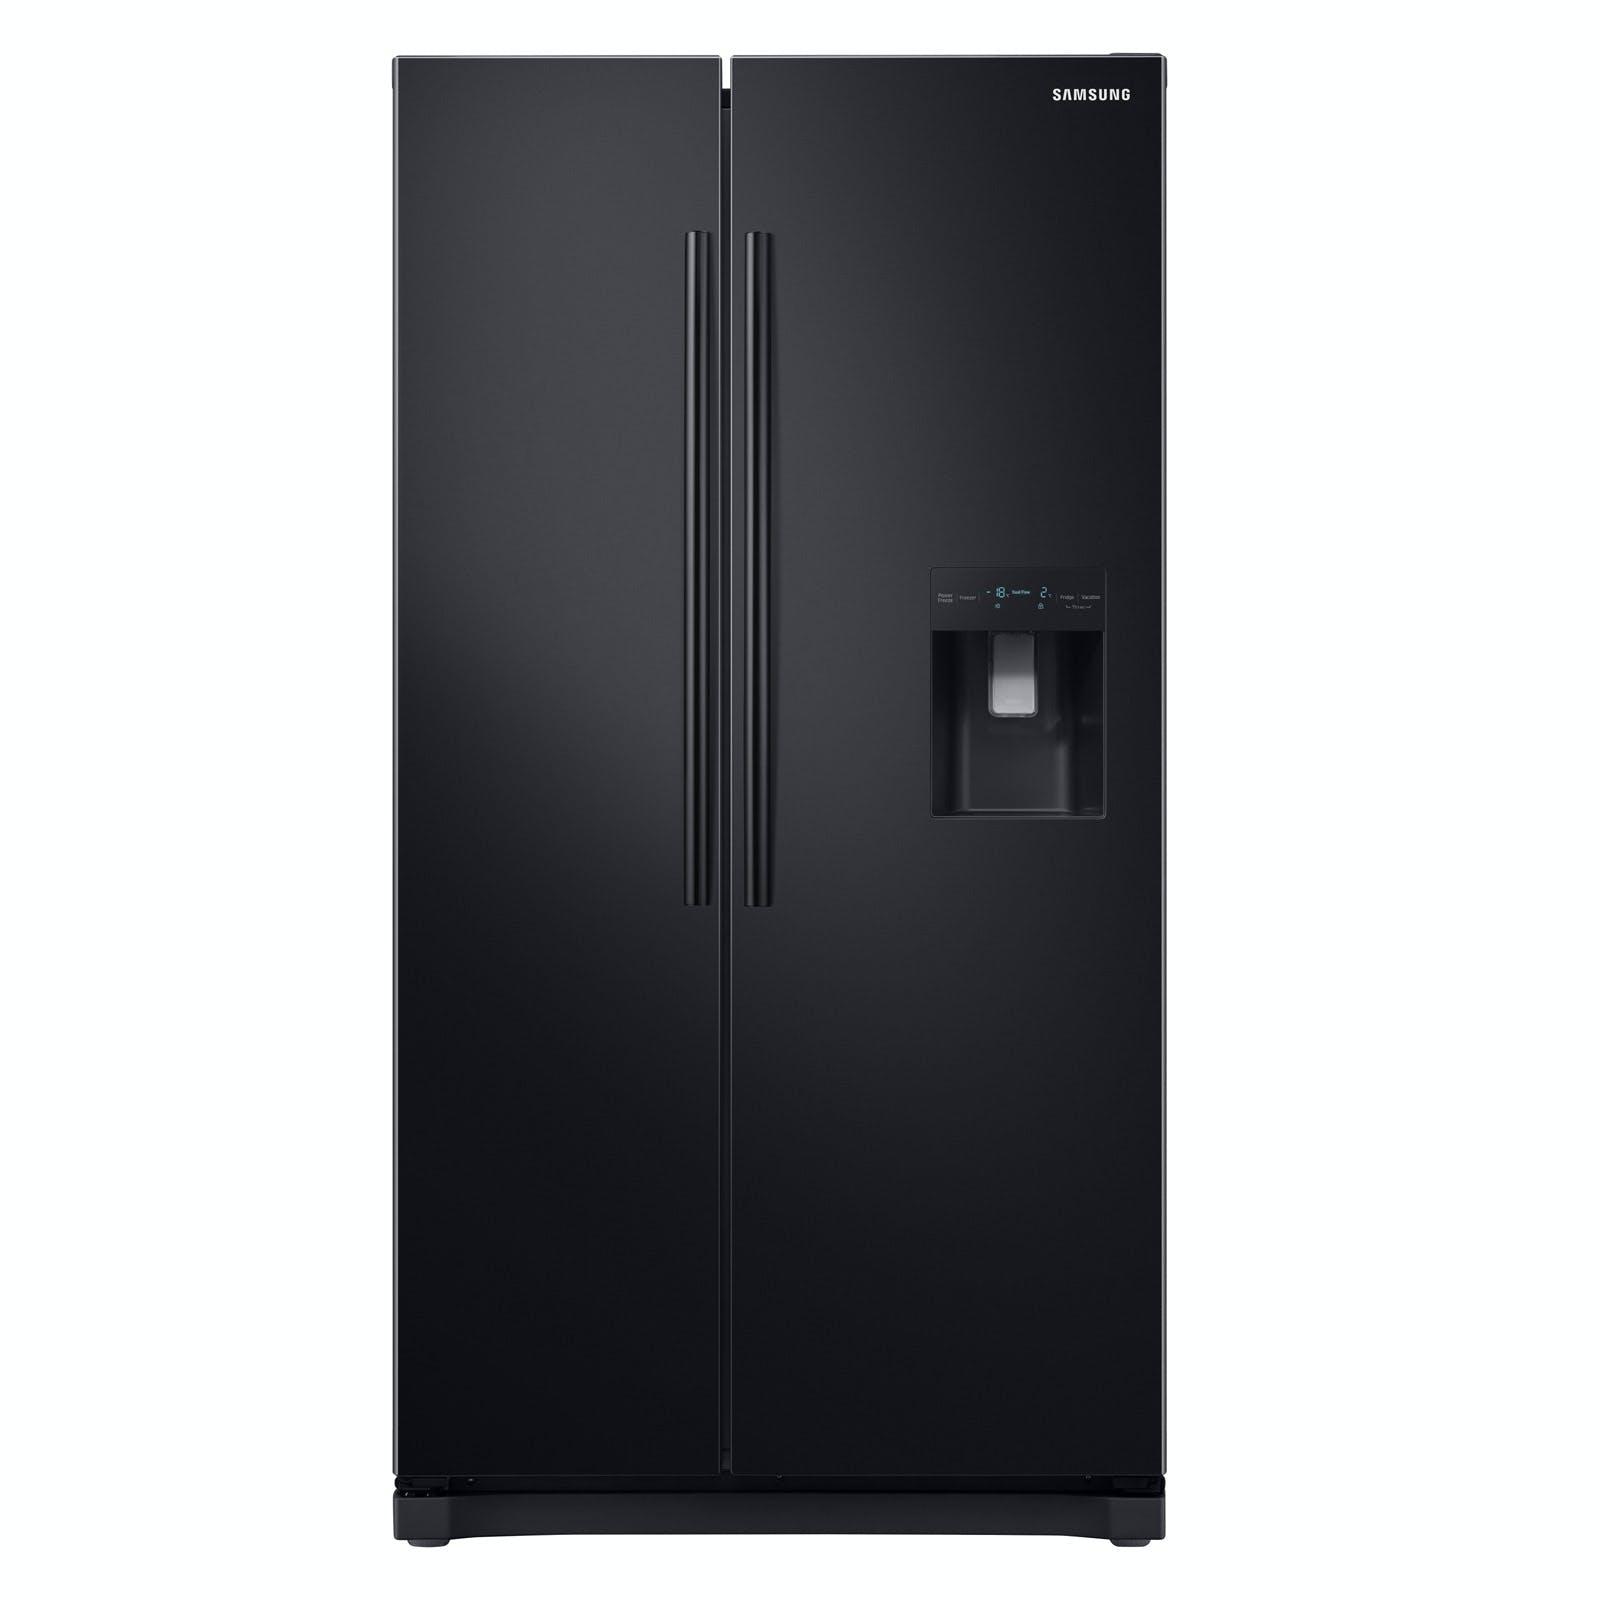 Samsung Rs52n3213bc American Fridge Freezer In Black